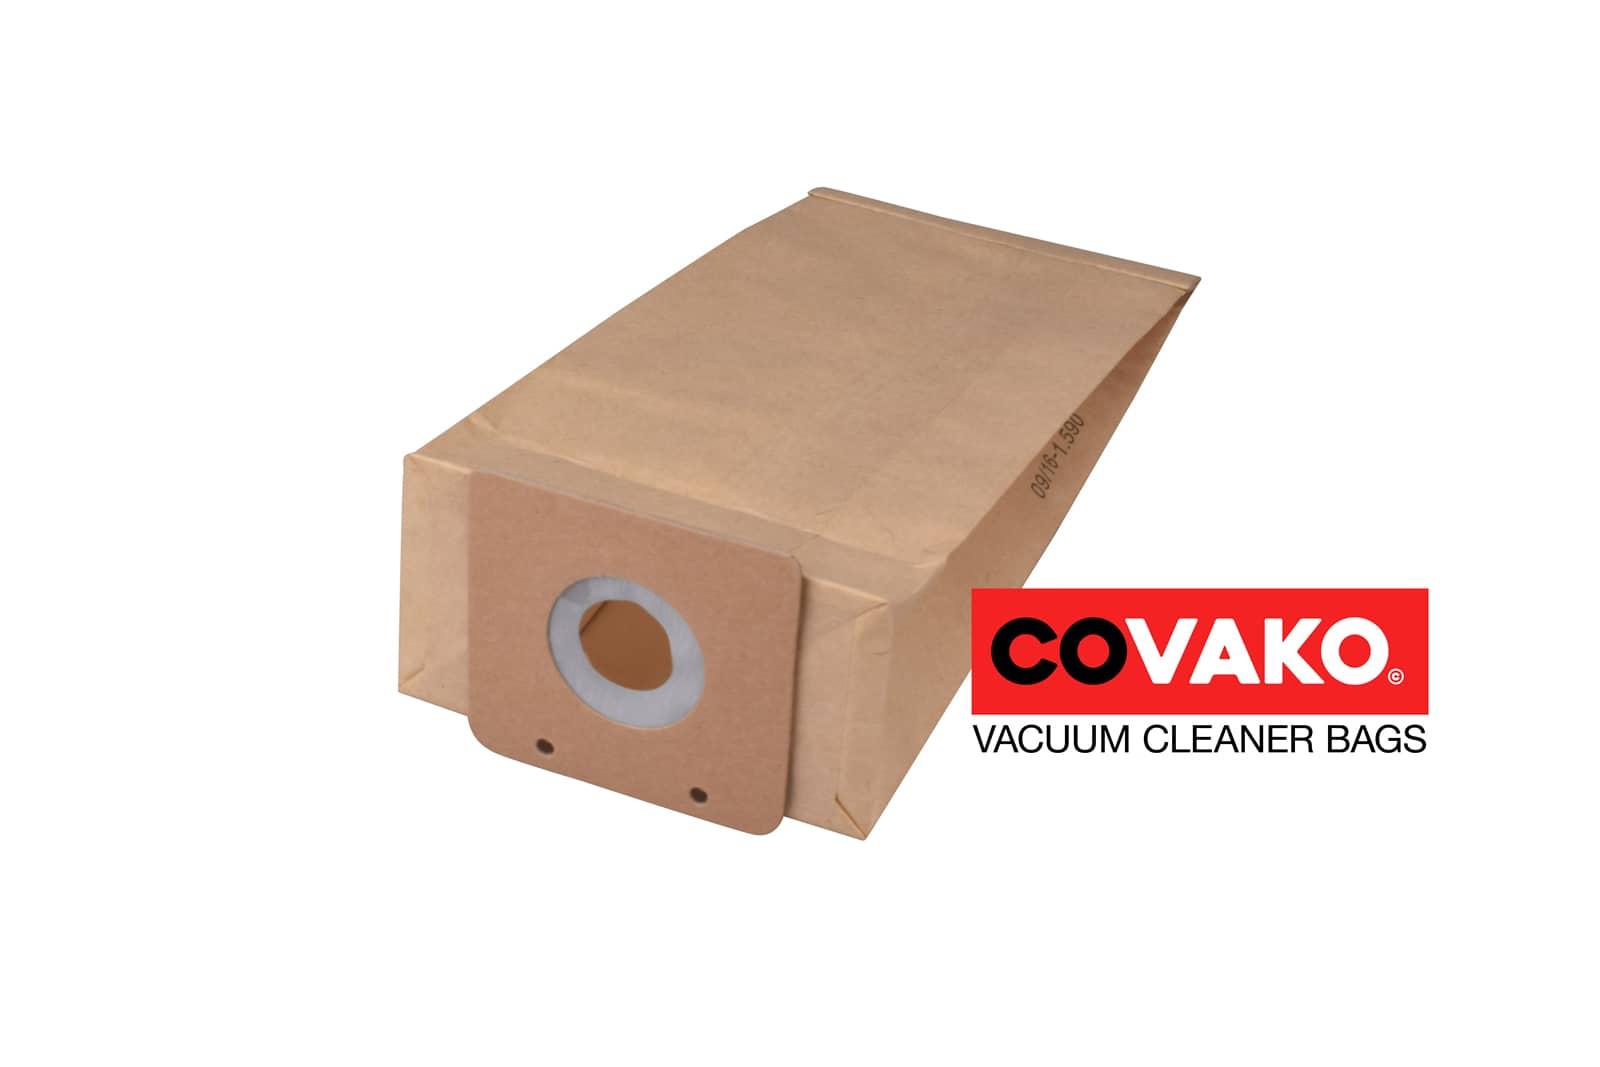 Kärcher T 7/1 / Papier - Kärcher sacs d'aspirateur